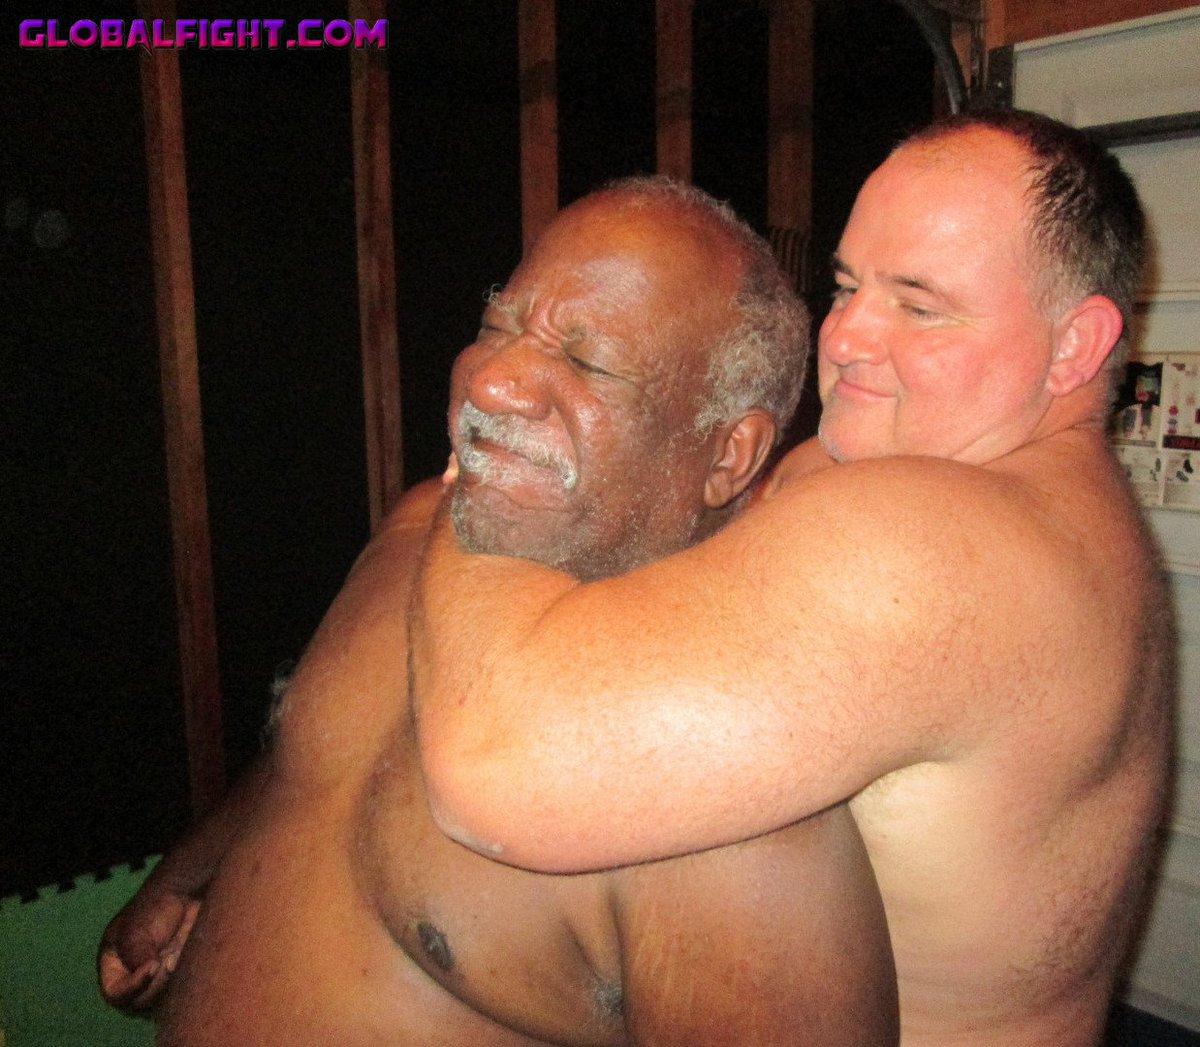 My garage wrestling bud from  http:// GLOBALFIGHT.com  &nbsp;   #garage #wrestling #home #backyard #wrestlers #fighting #musclebears #black #daddy #guy<br>http://pic.twitter.com/gOjwrKtt77